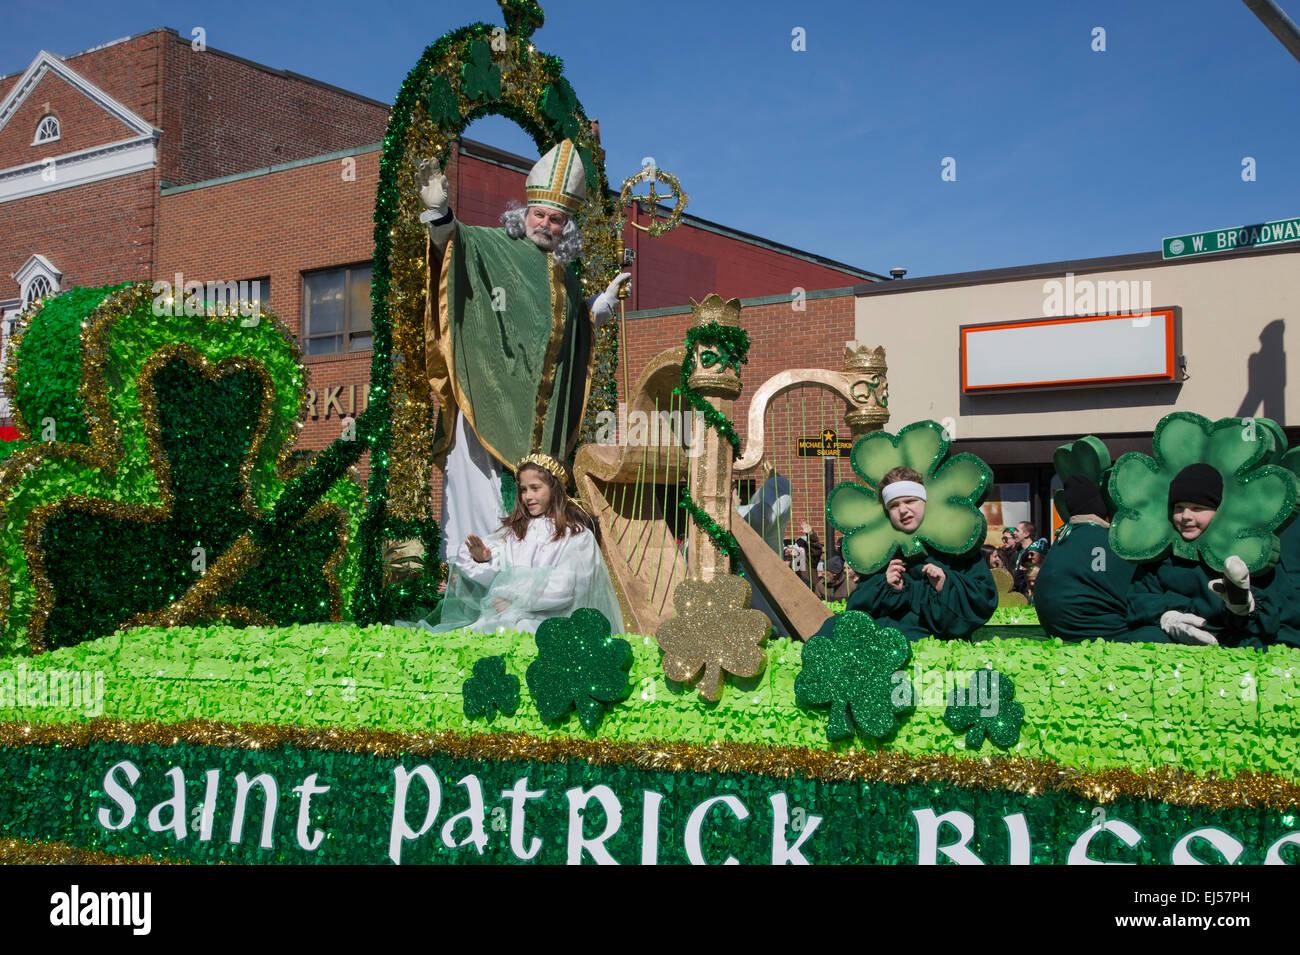 St. Patrick blessing crowd, St. Patrick's Day Parade, 2014, South Boston, Massachusetts, USA - Stock Image